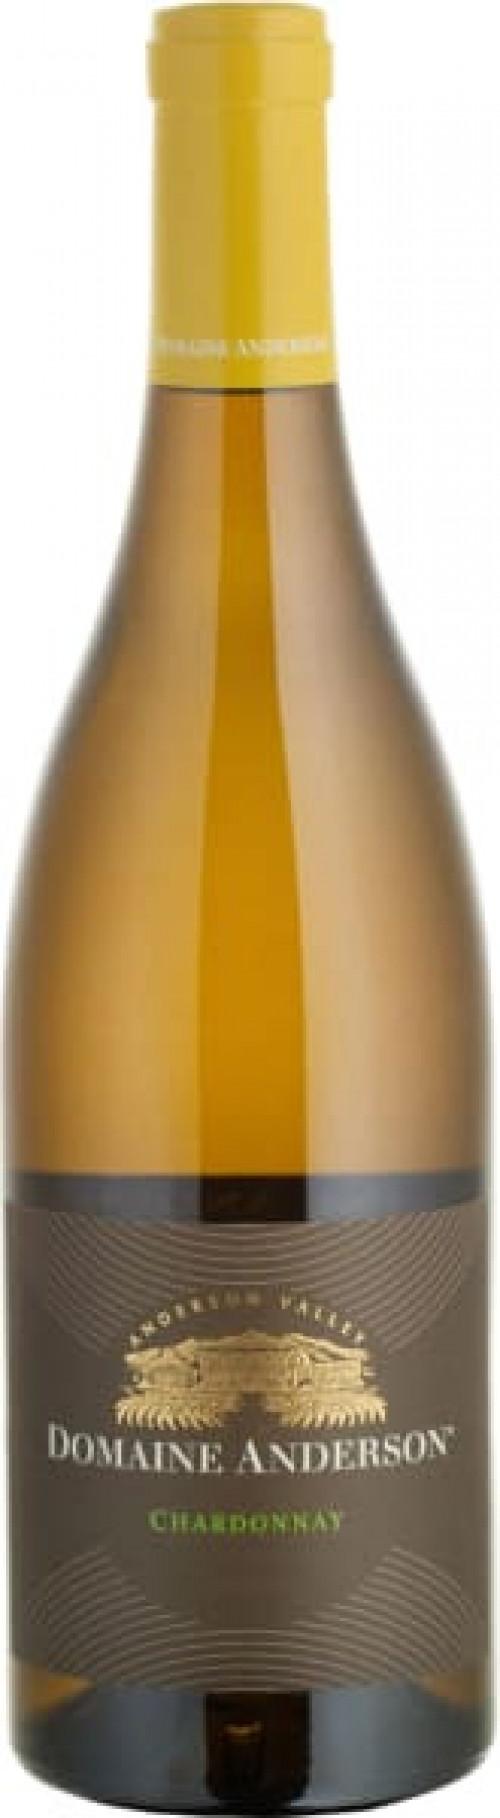 2017 Domaine Anderson Chardonnay 750ml